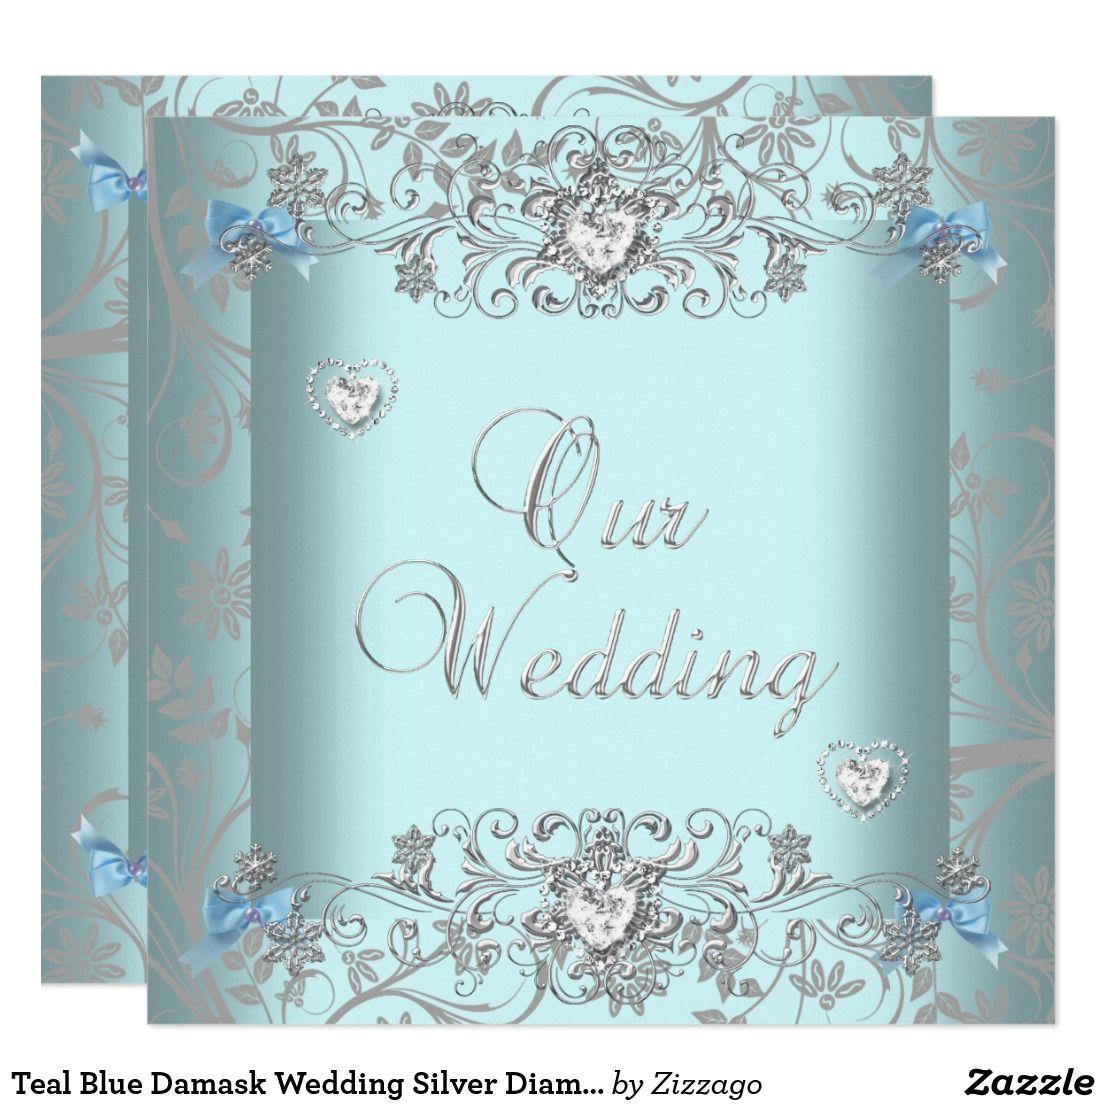 Teal Blue Damask Wedding Silver Diamond Hearts Invitation | Silver wedding  theme, Damask wedding, Silver wedding